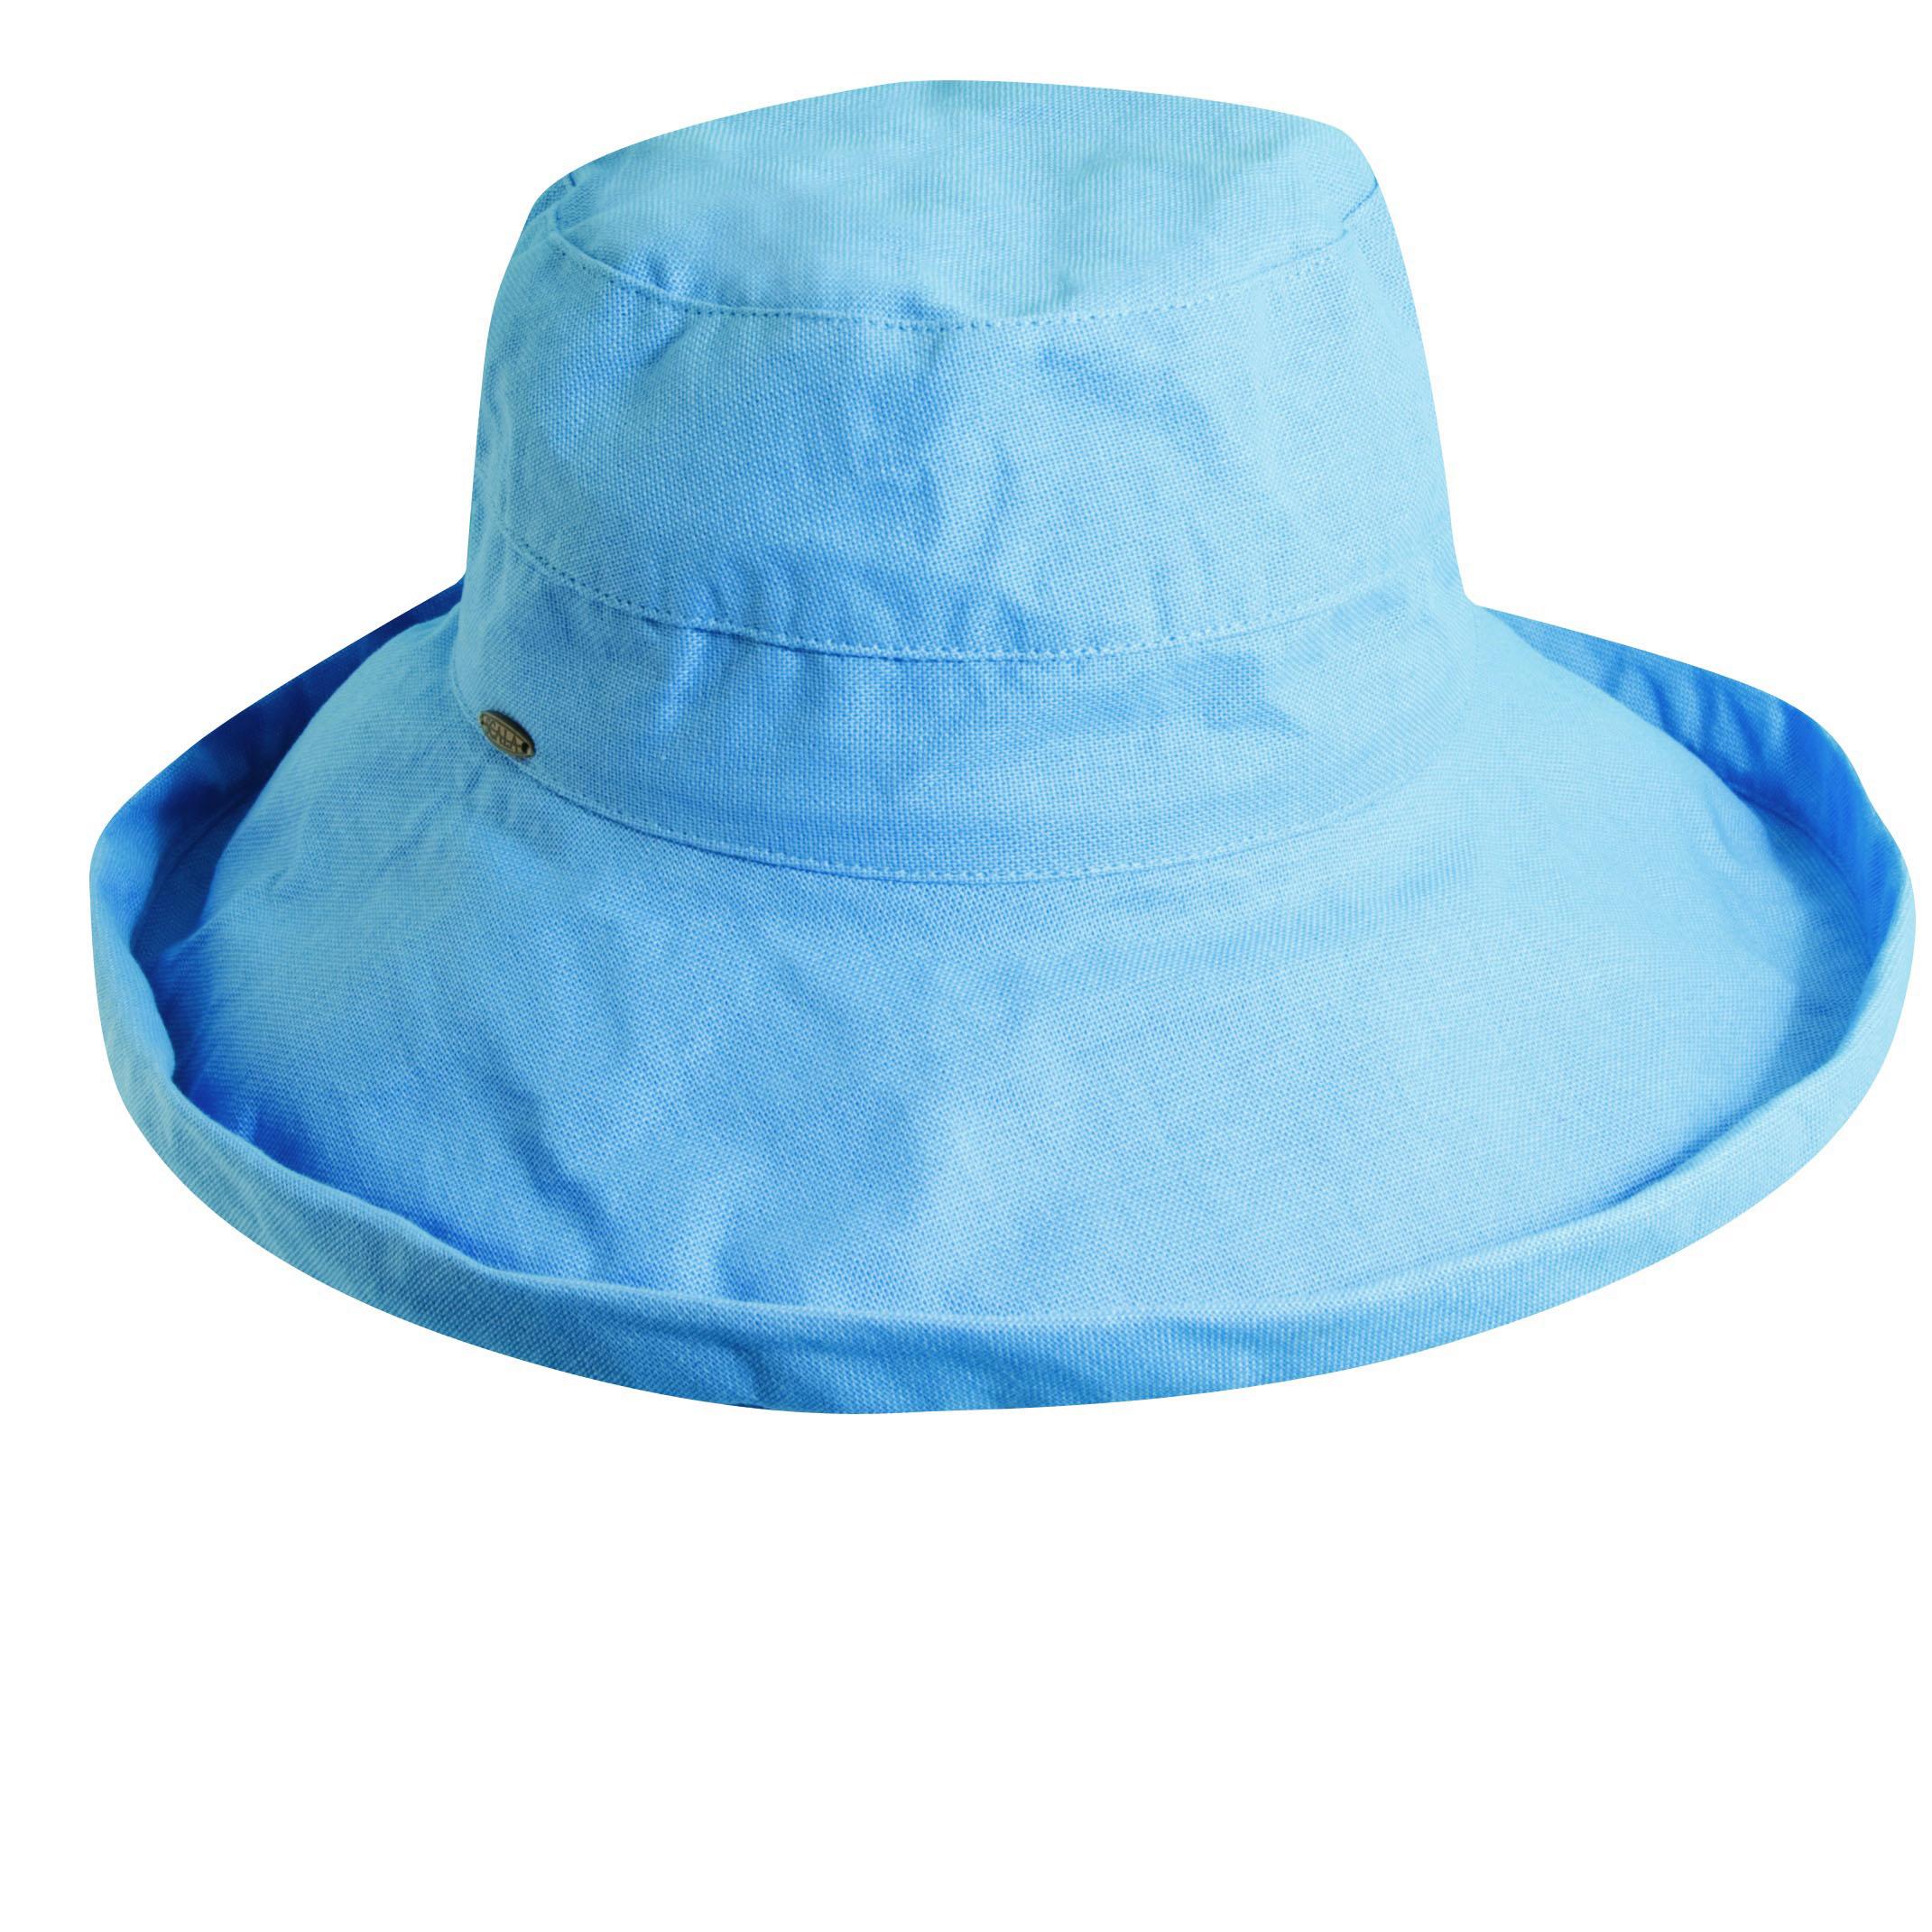 Blue Sun Hat - Hat HD Image Ukjugs.Org 1516313f2d2